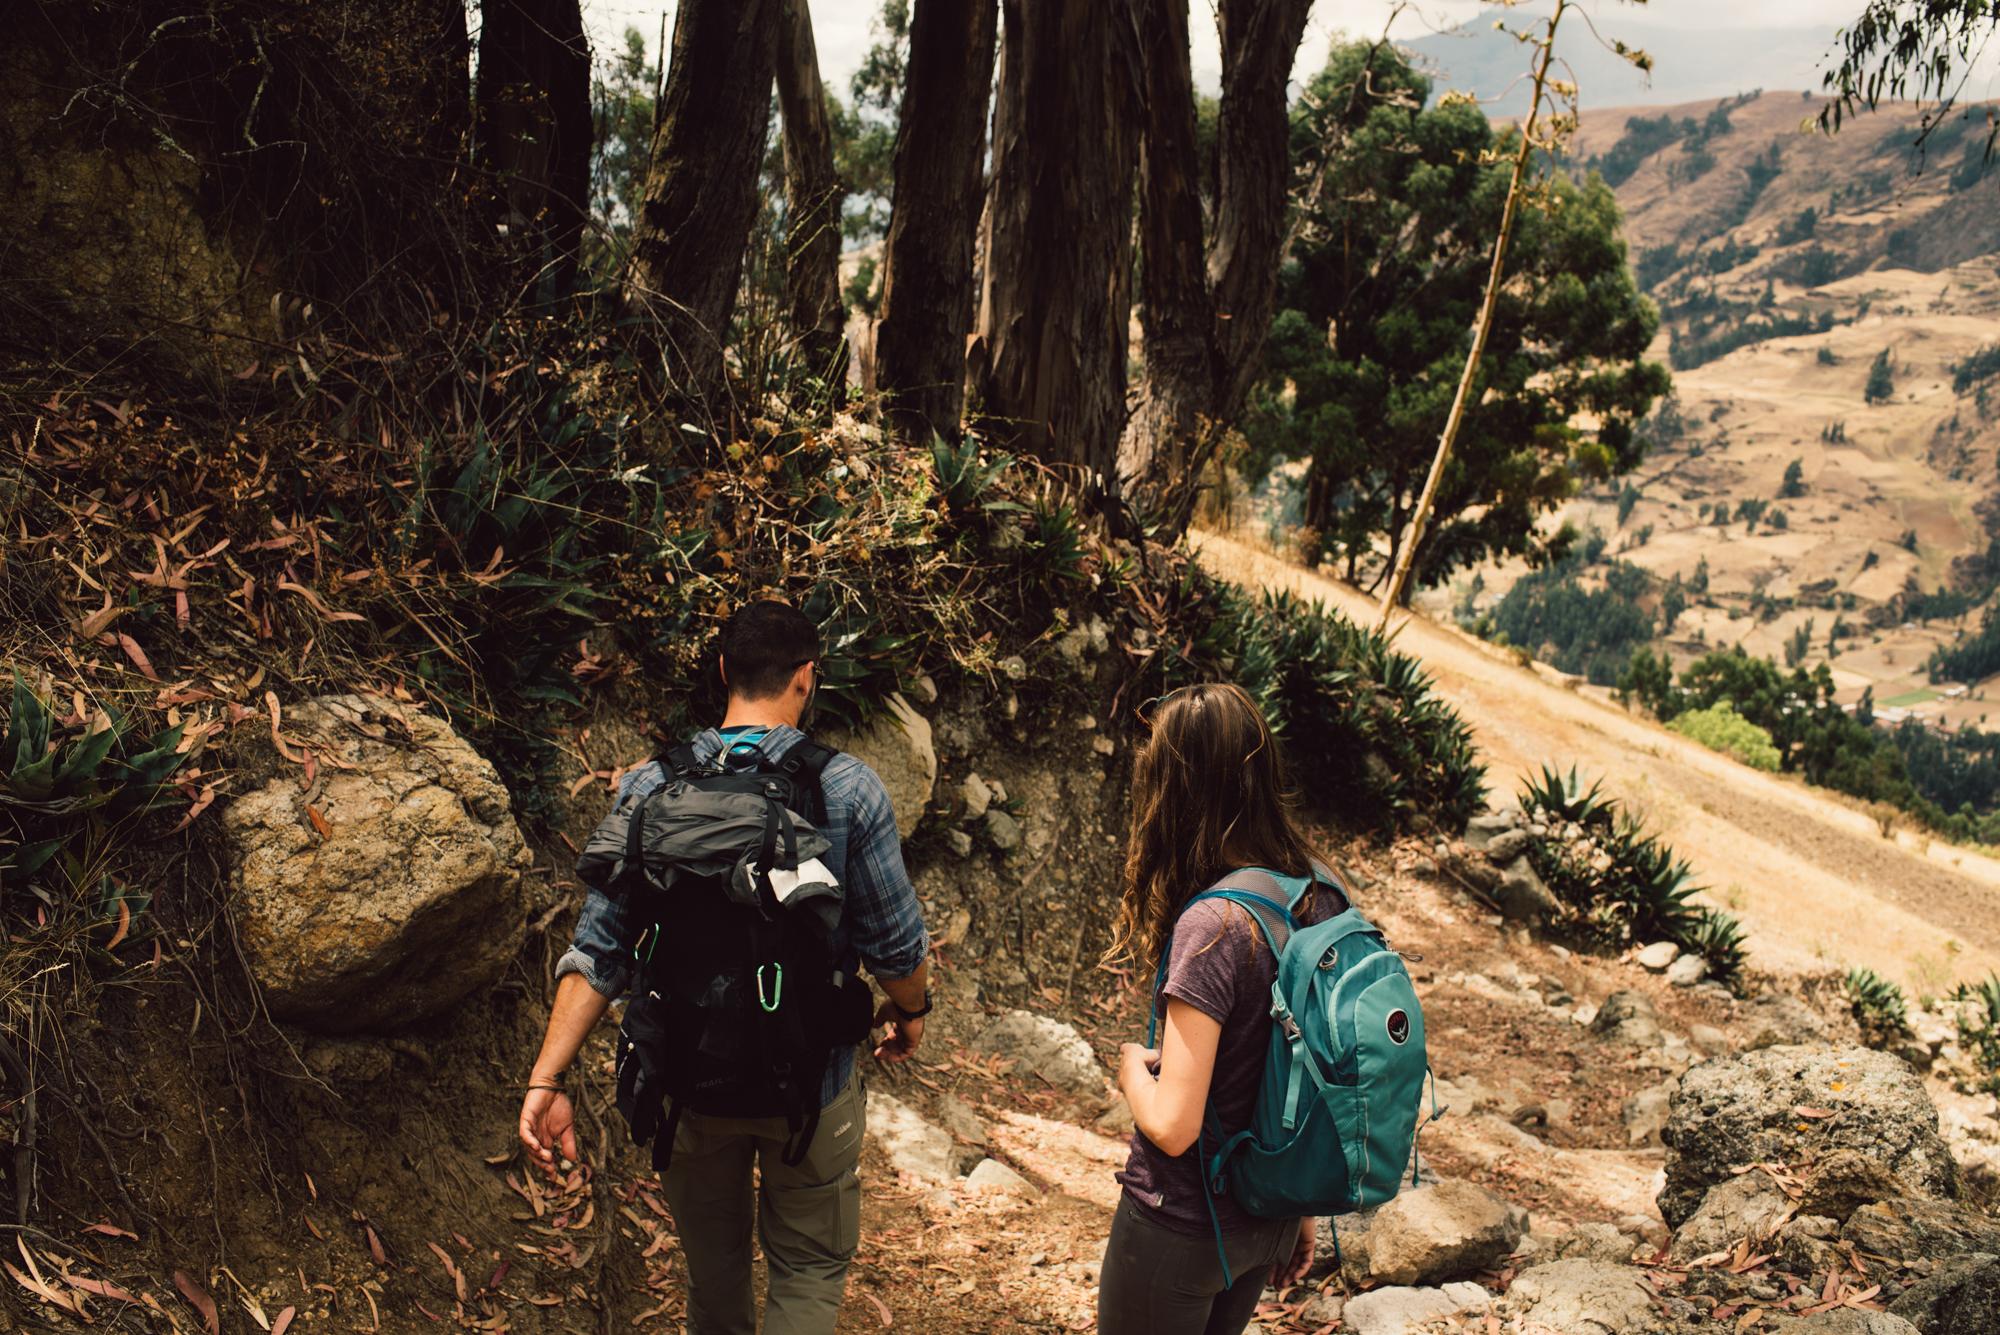 Damian and Jesse Engagement Session Huayhuash Mountain Trekking Peru_56.JPG